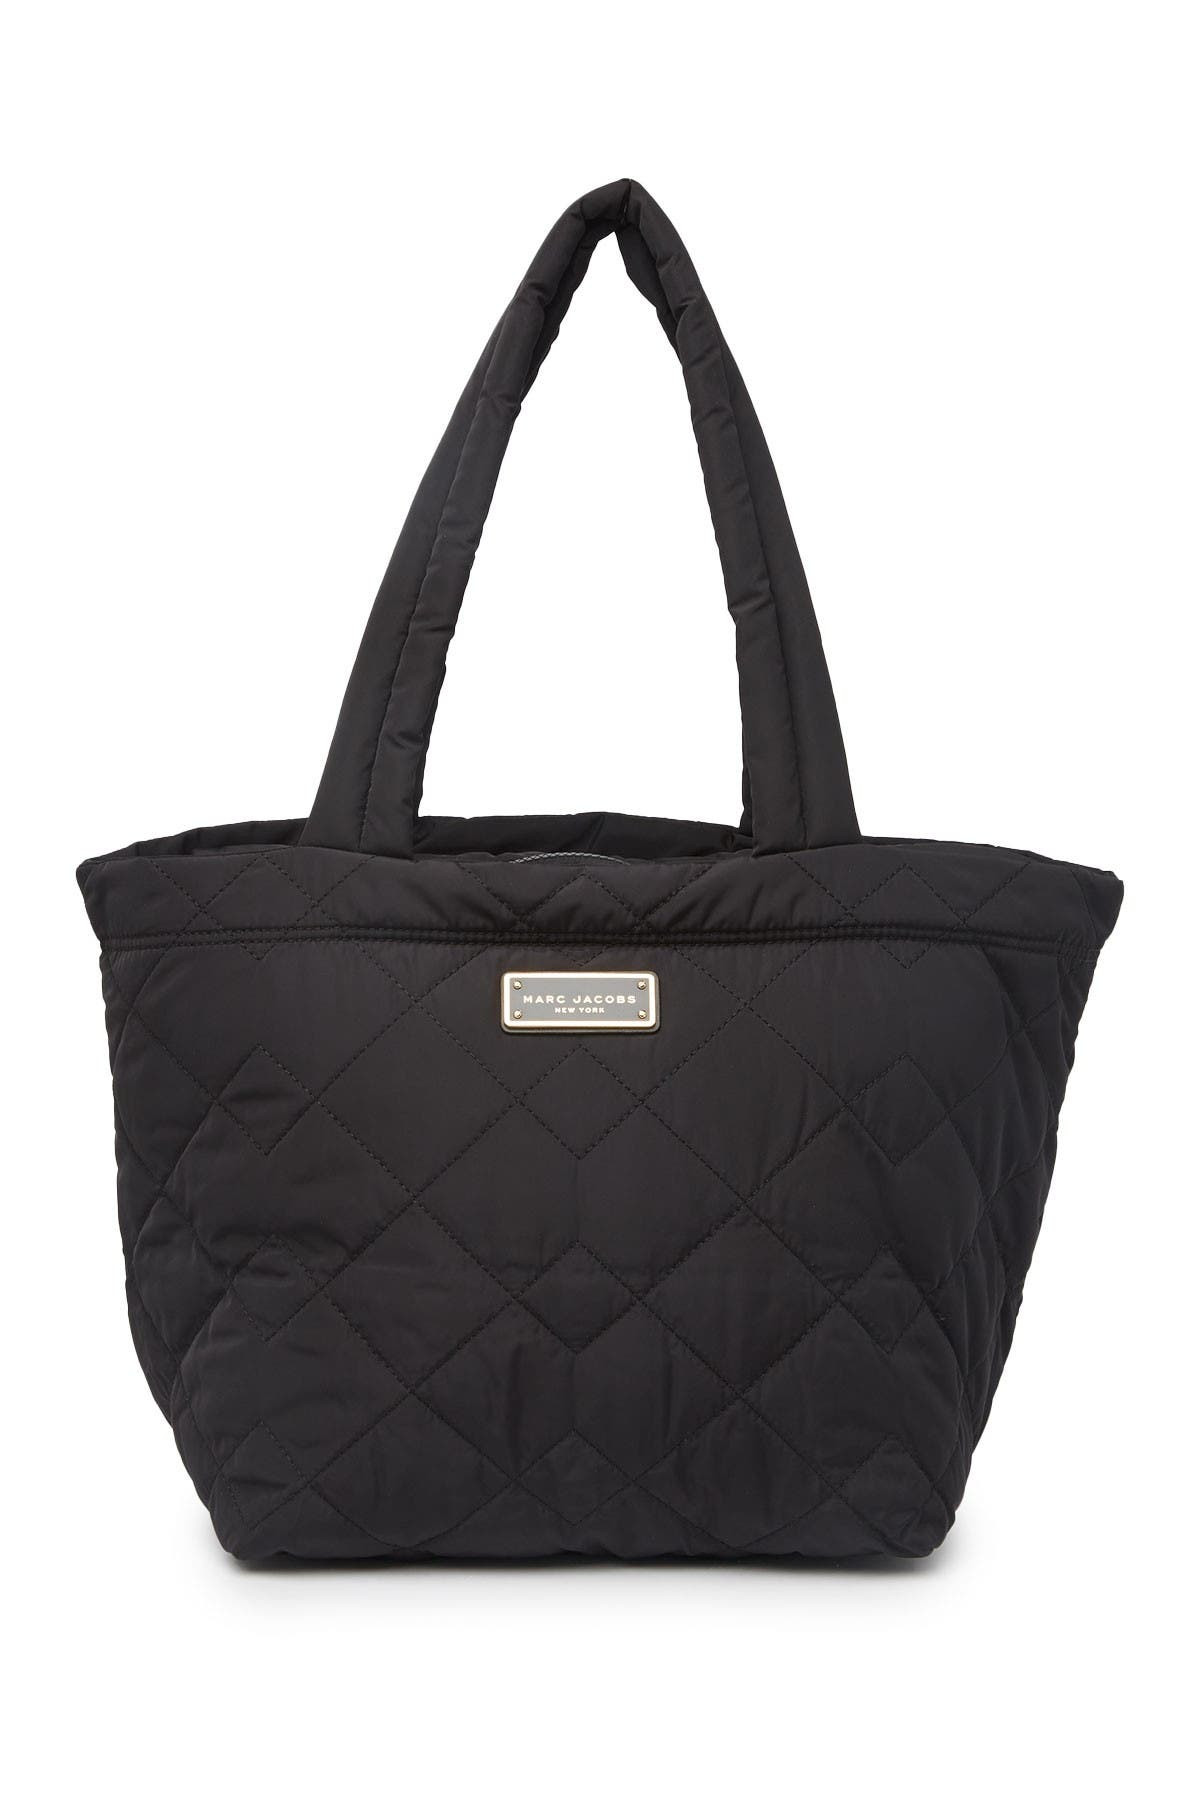 Quilted Nylon Medium Tote Bag In Black